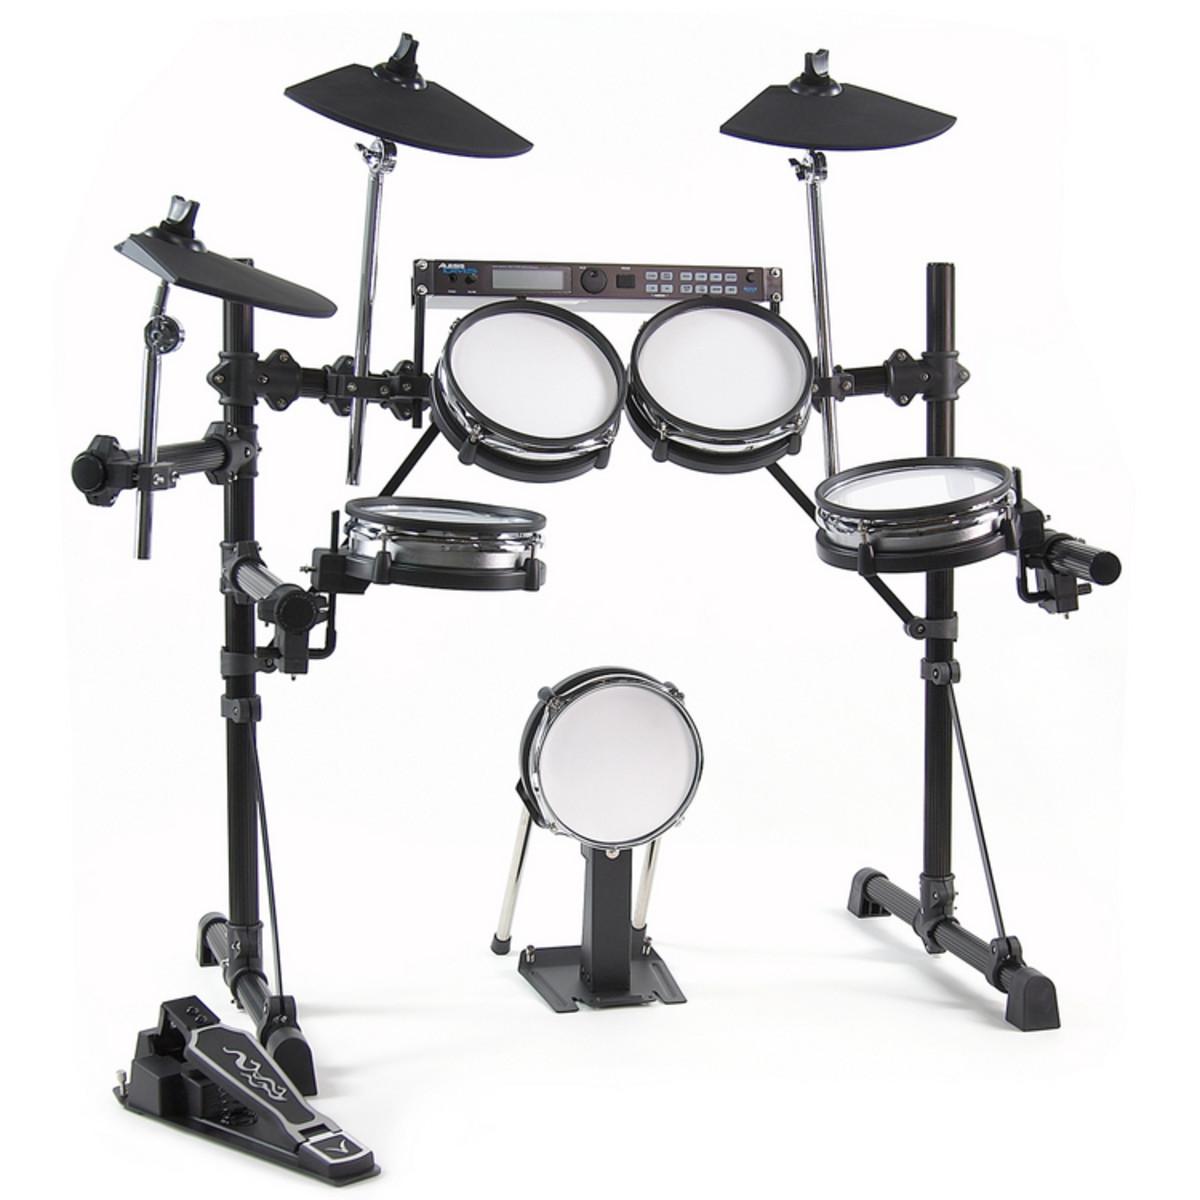 87349c103227 DISCONTINUED Alesis DM5 Pro Electronic Drum Kit. DM5PROKit. Loading zoom